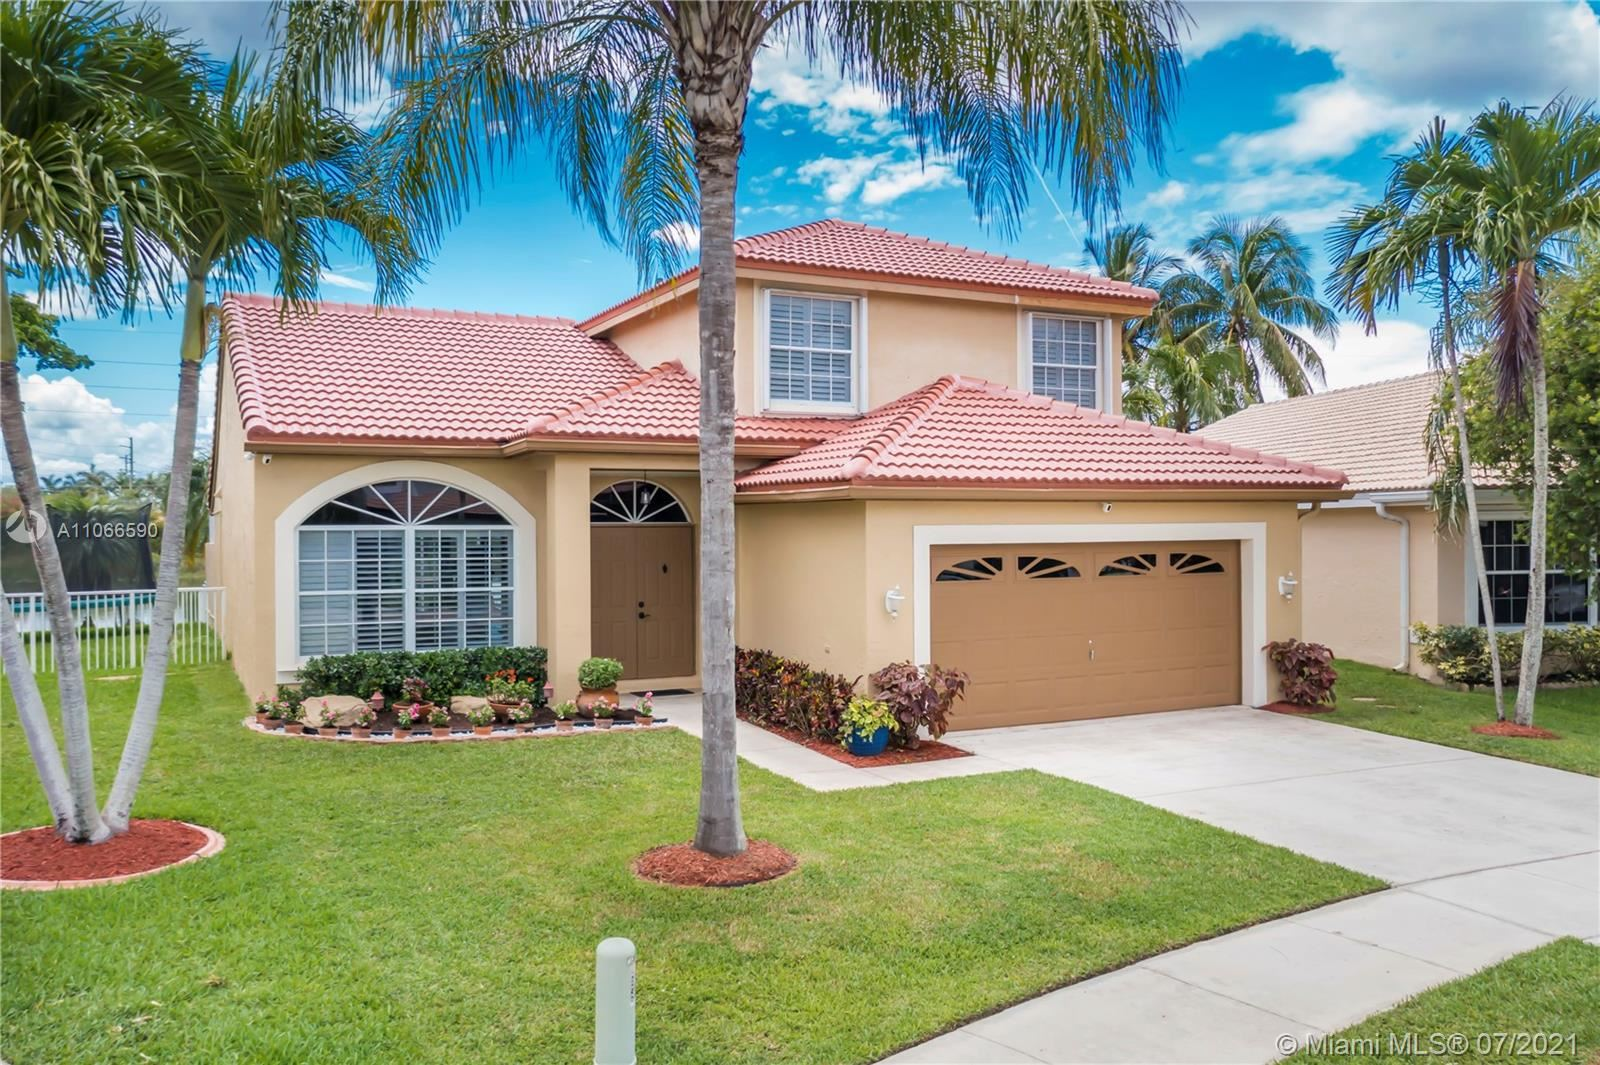 1398 SW 181st Ave, Pembroke Pines, FL 33029 - #: A11066590